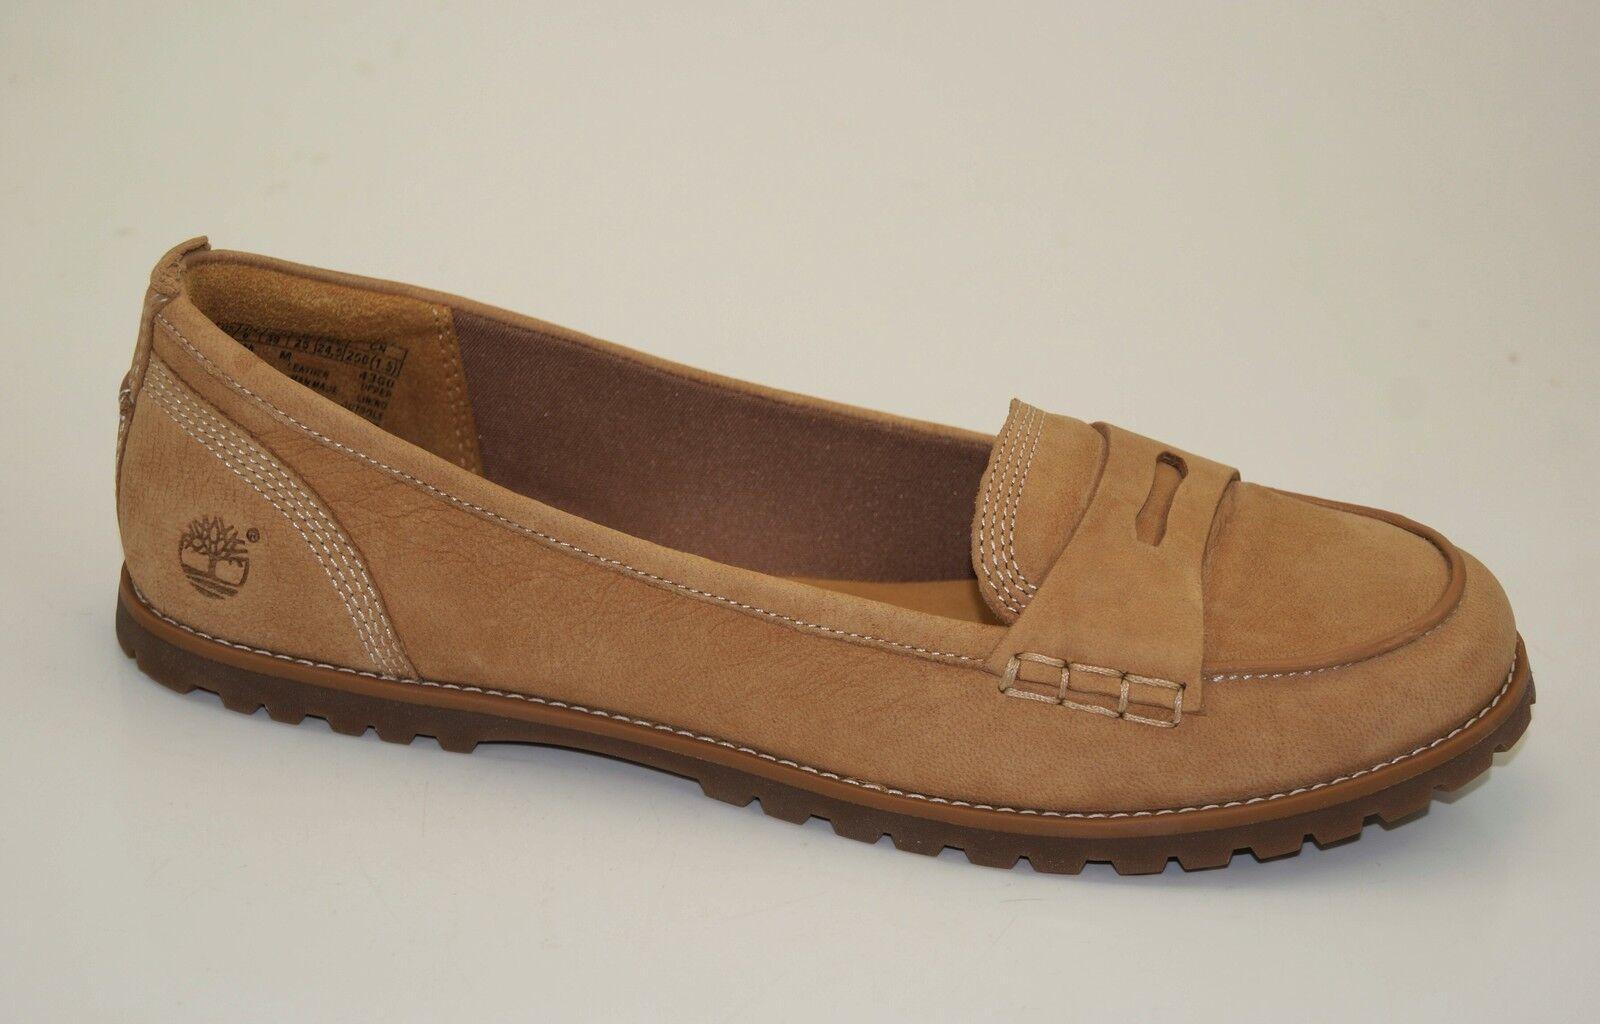 e2174b205e6 Timberland Joslin Penny Size 39 US 8 Loafers Moccasins Slippers ...